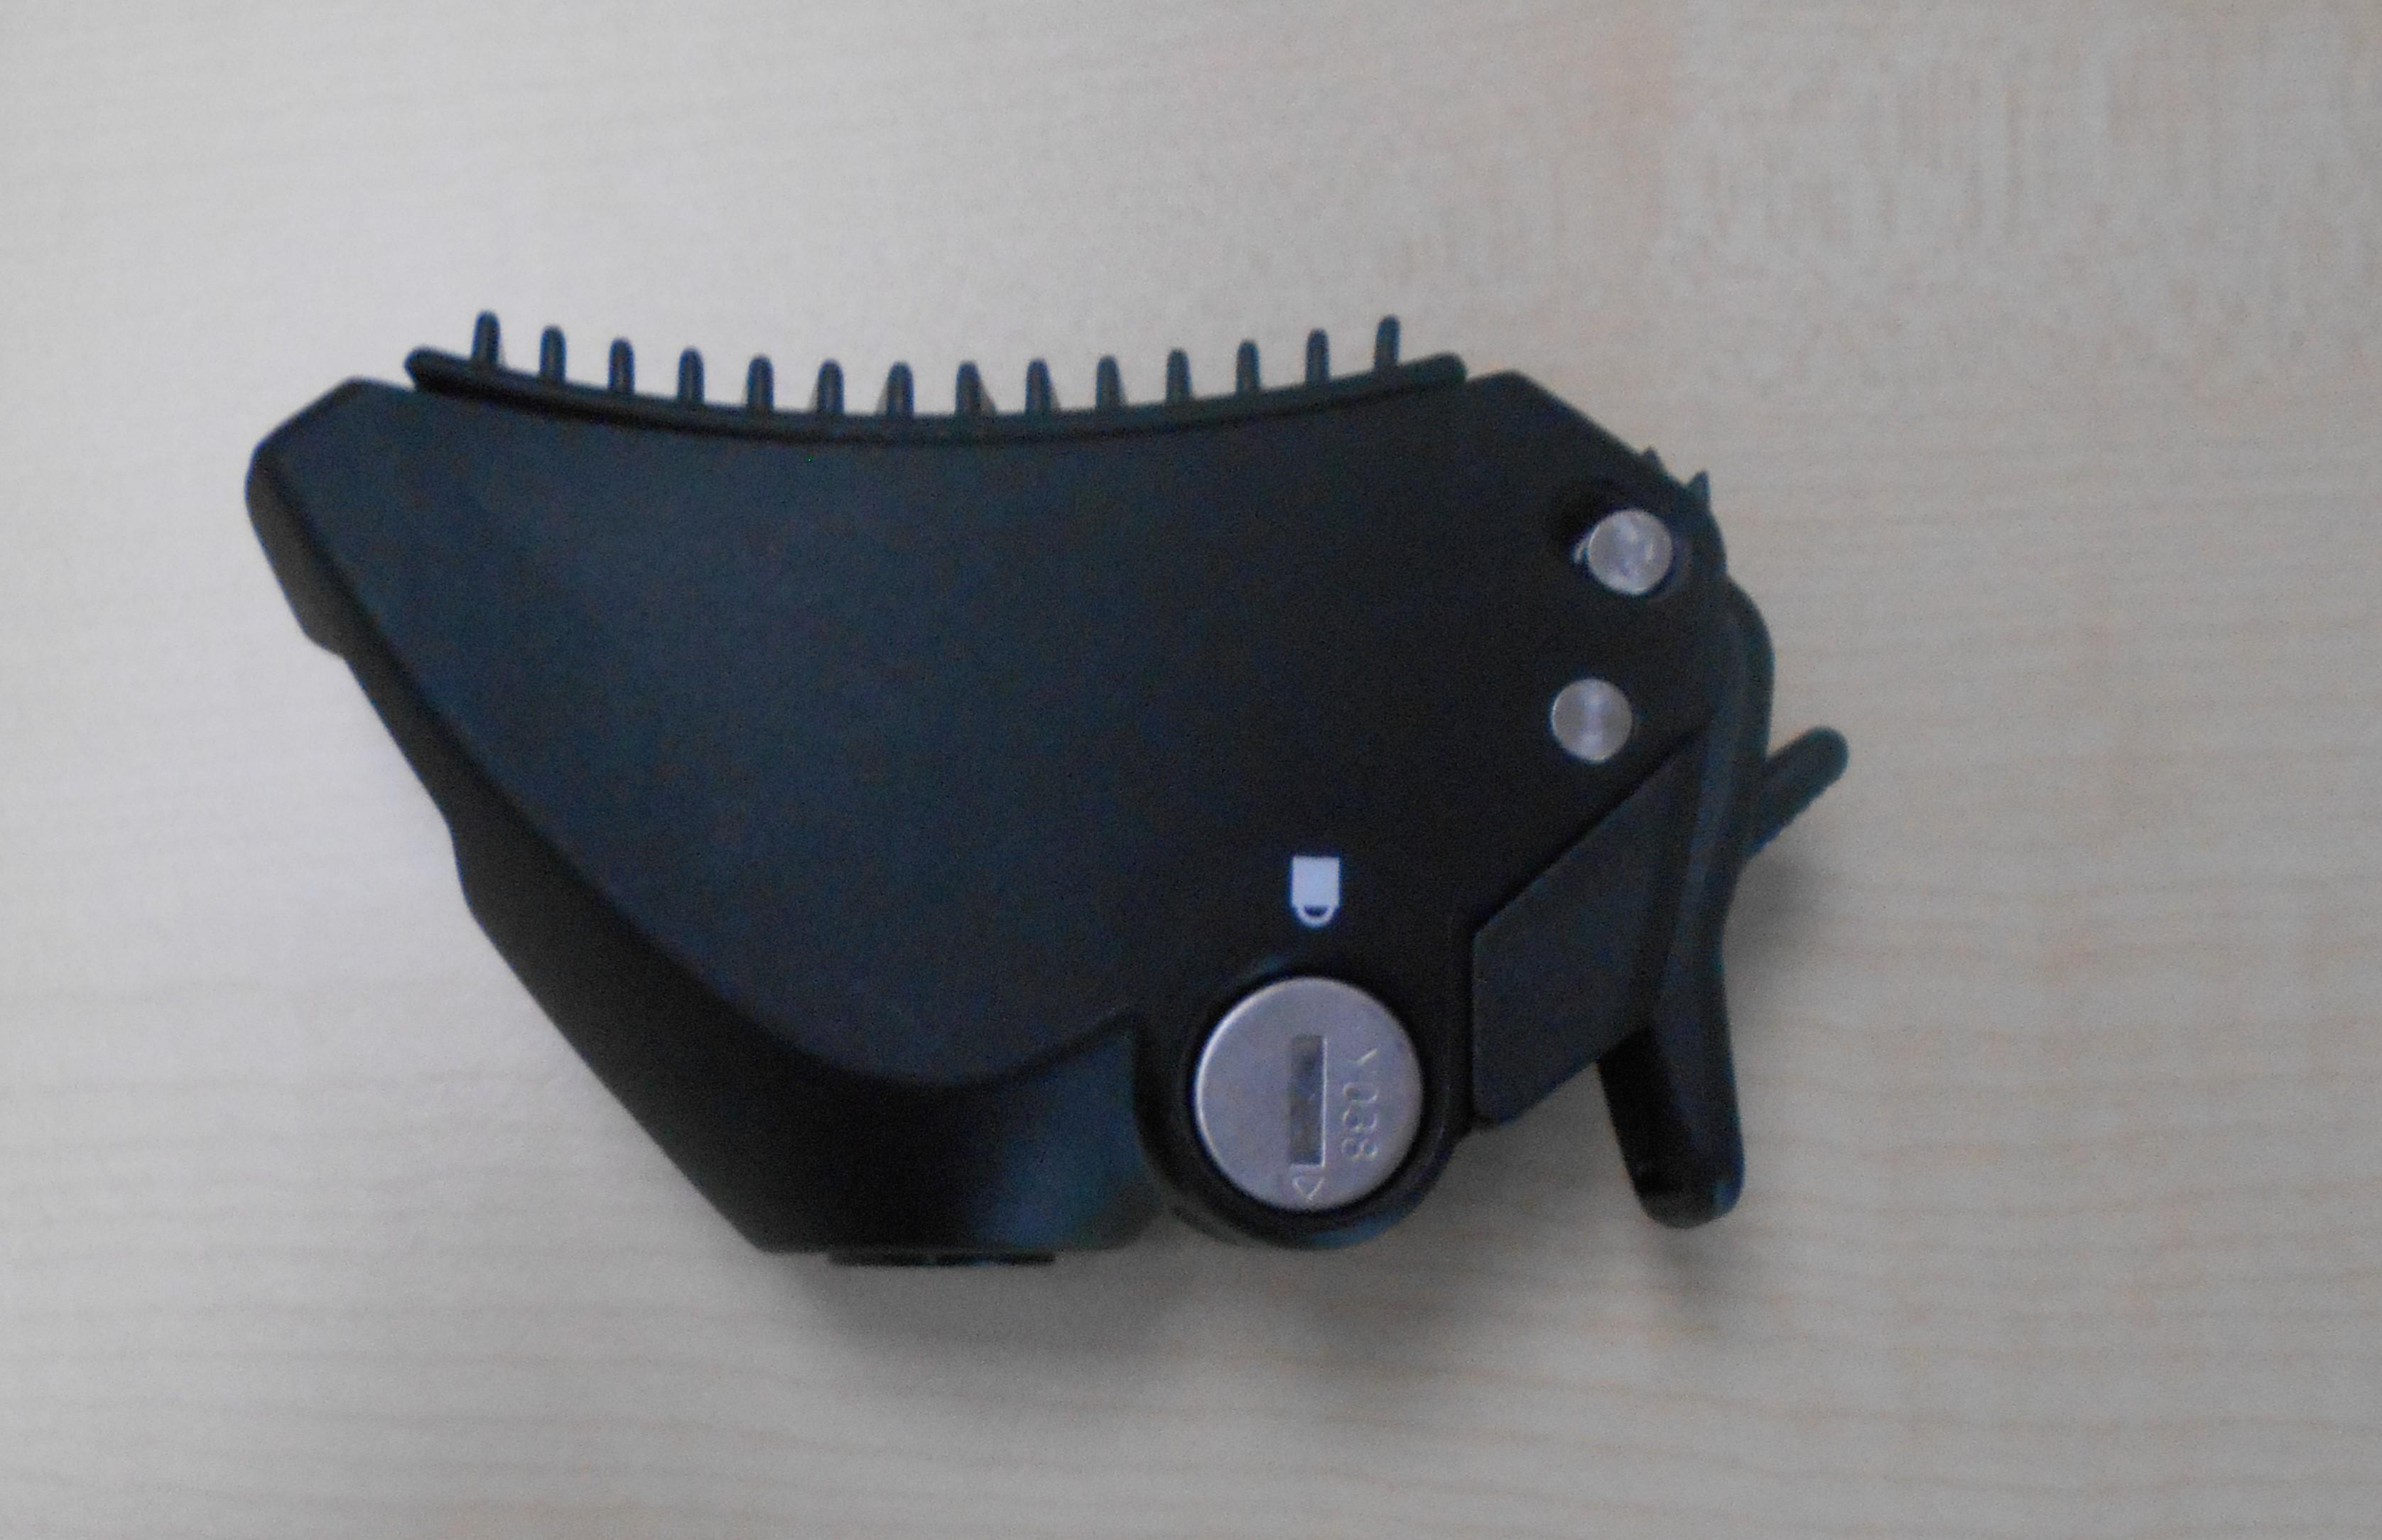 Kopf E-Bike Rahmenhalter mit Schlosscode Y003